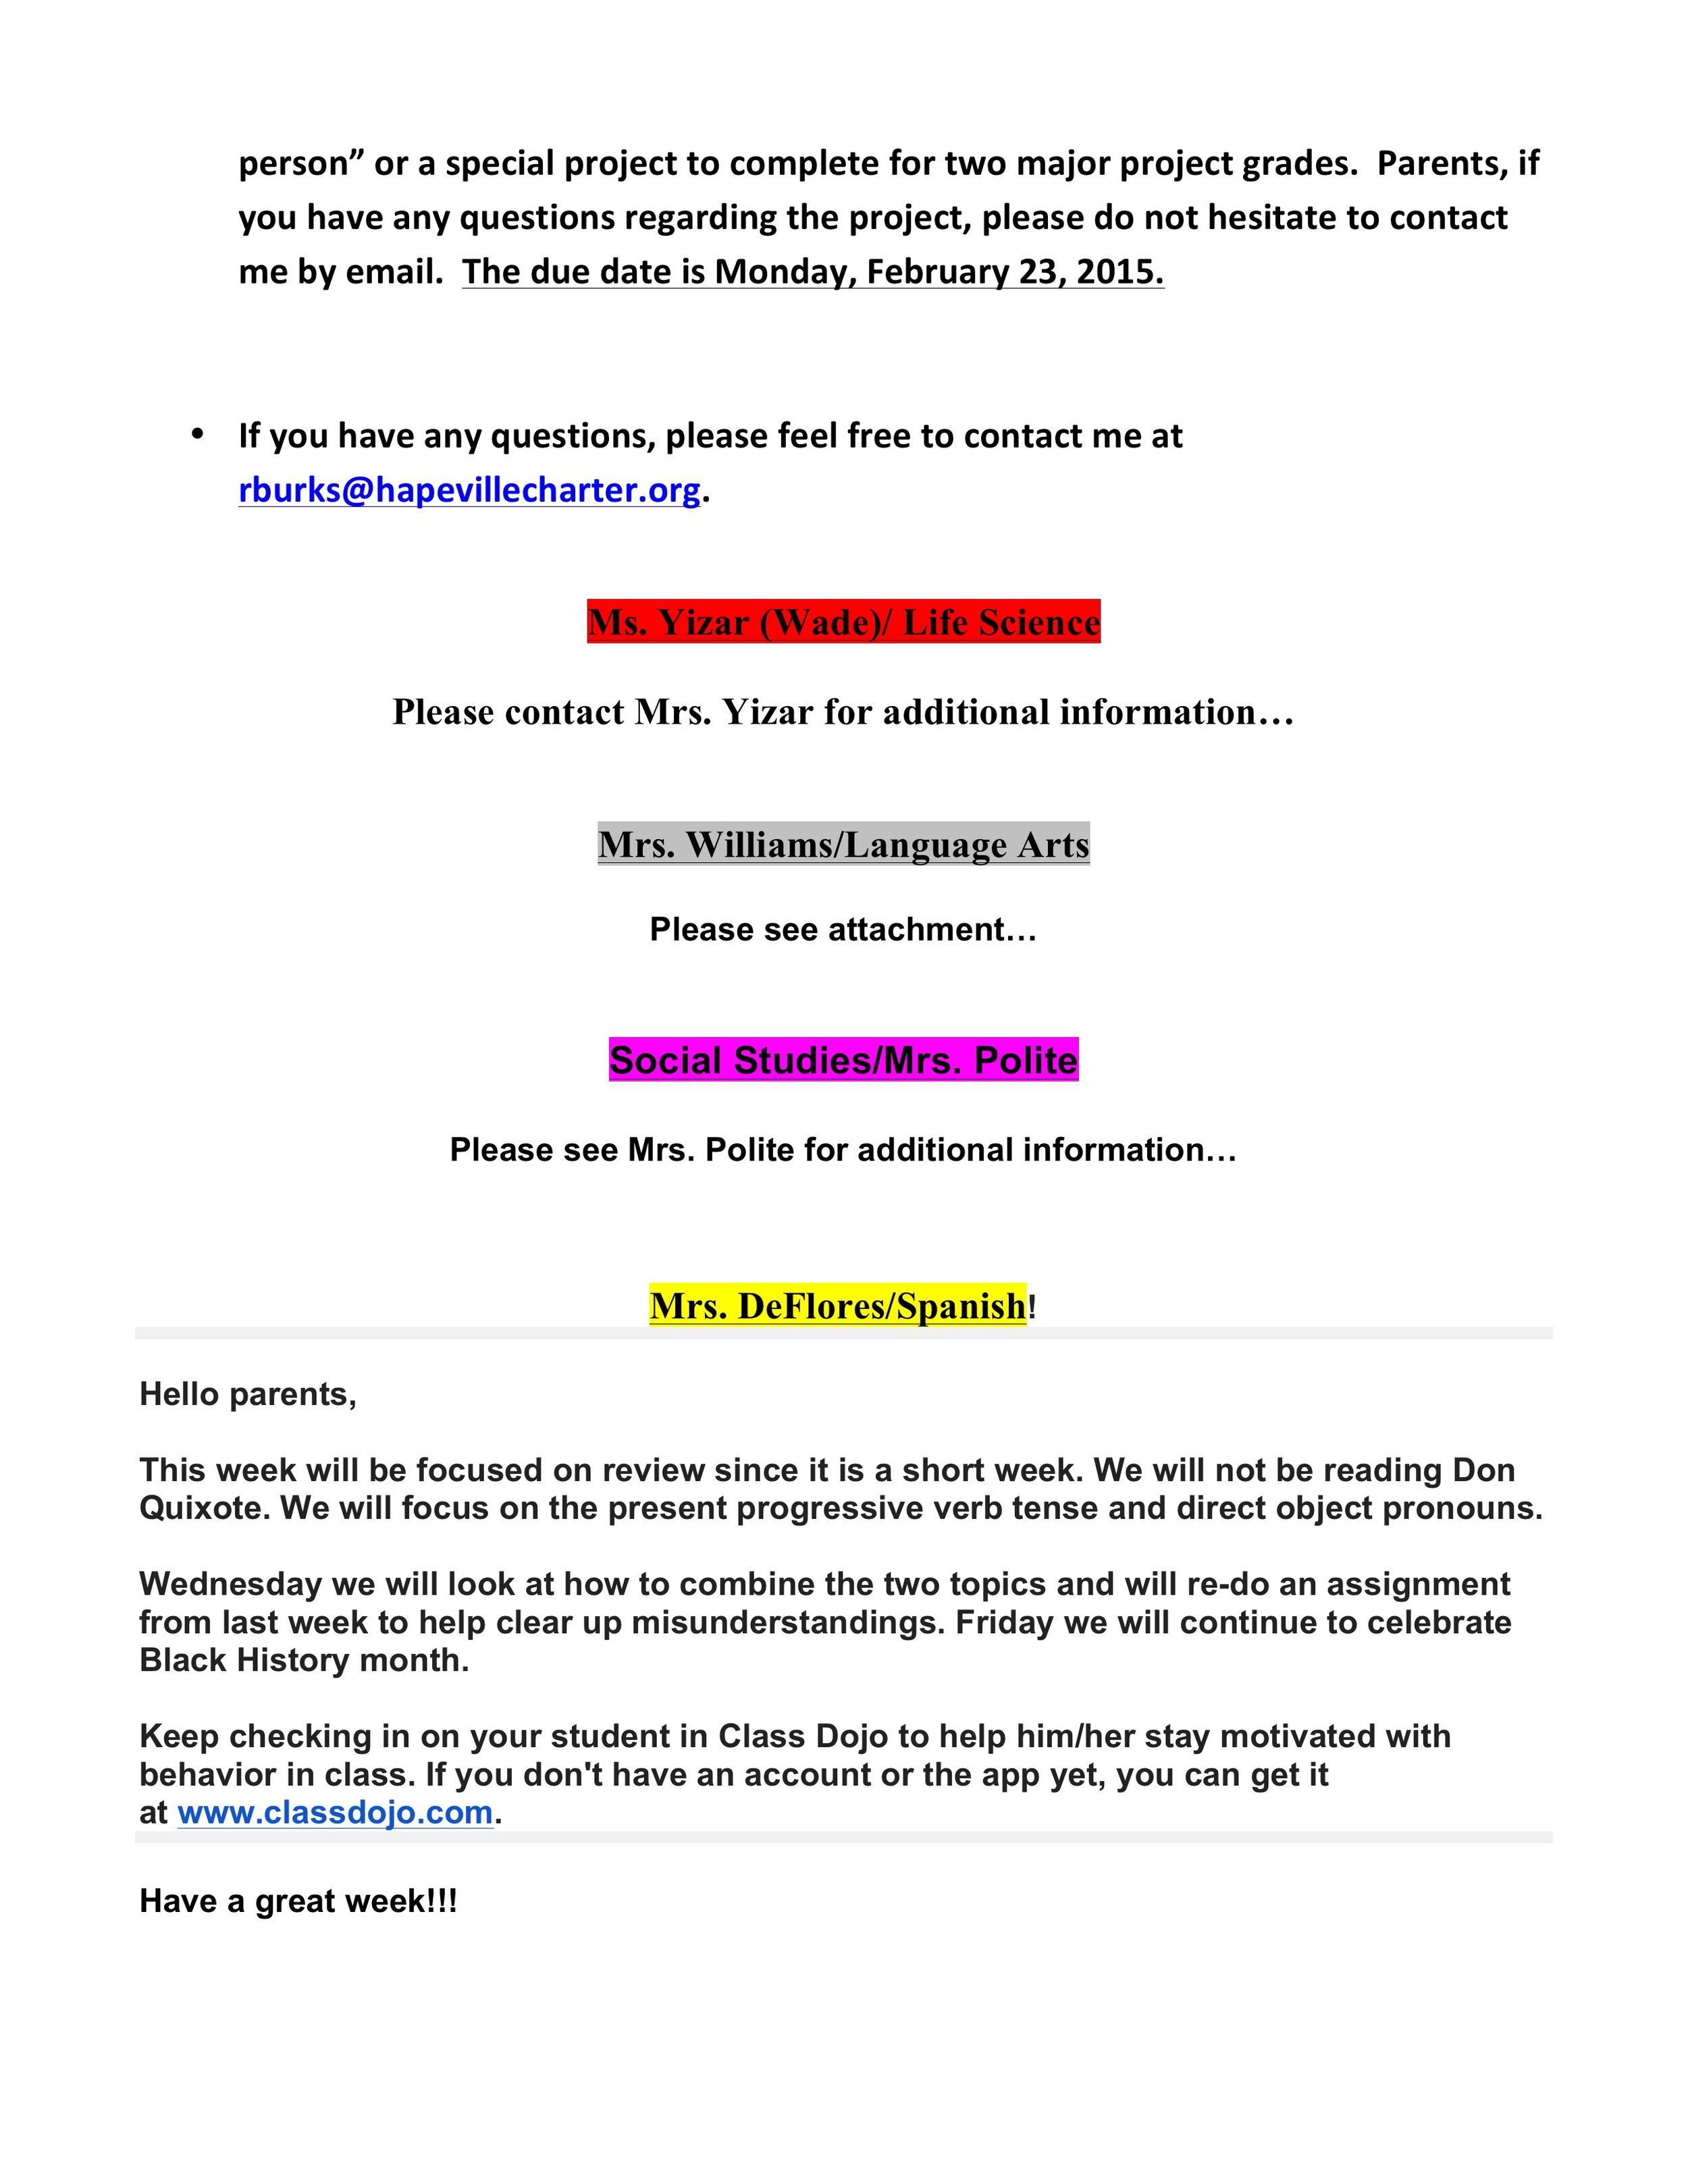 Newsletter Image7th grade feb 16th 4.jpeg